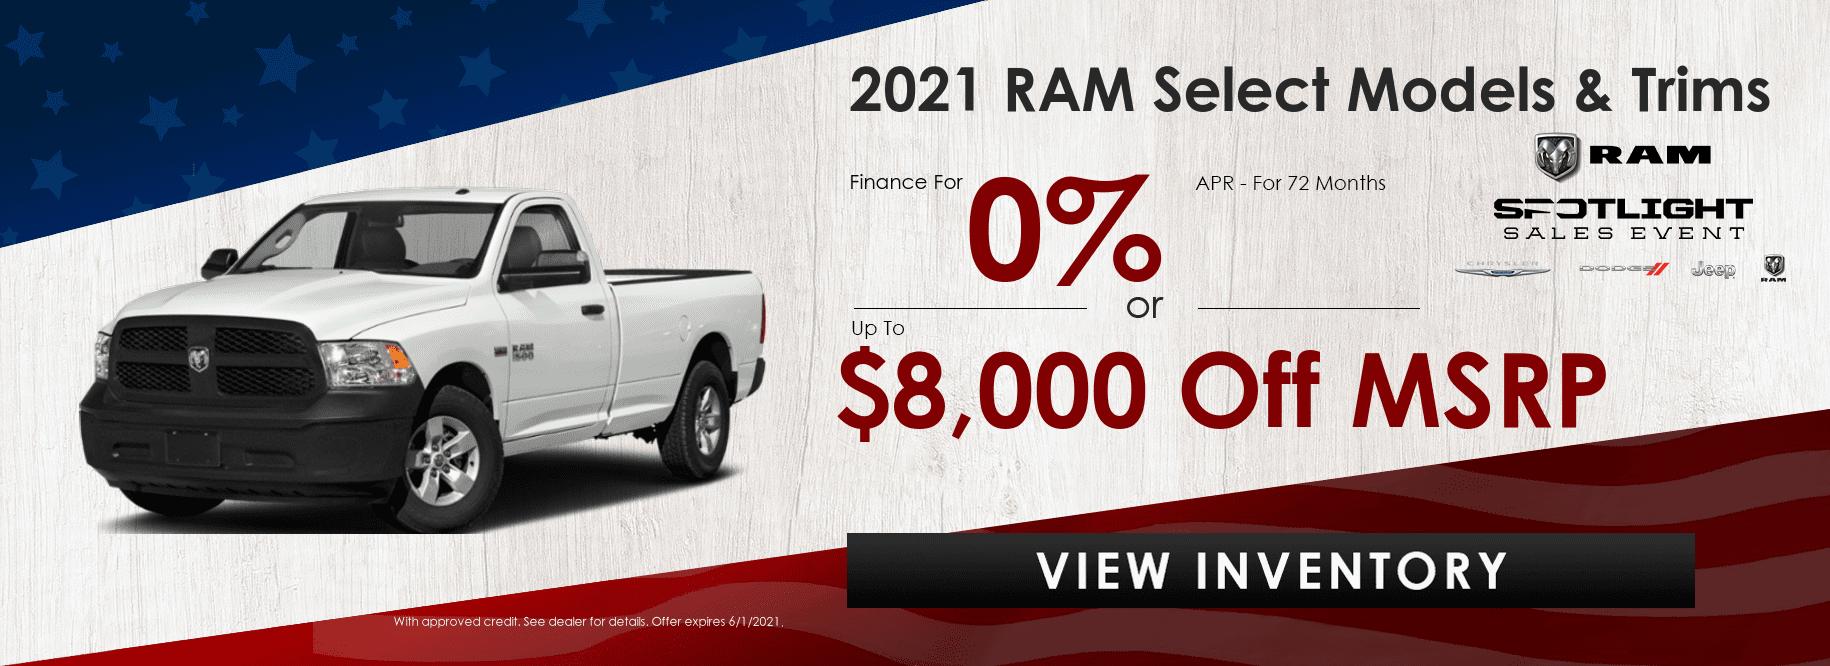 2021-RAM-Select-Models-&-Trims-73000